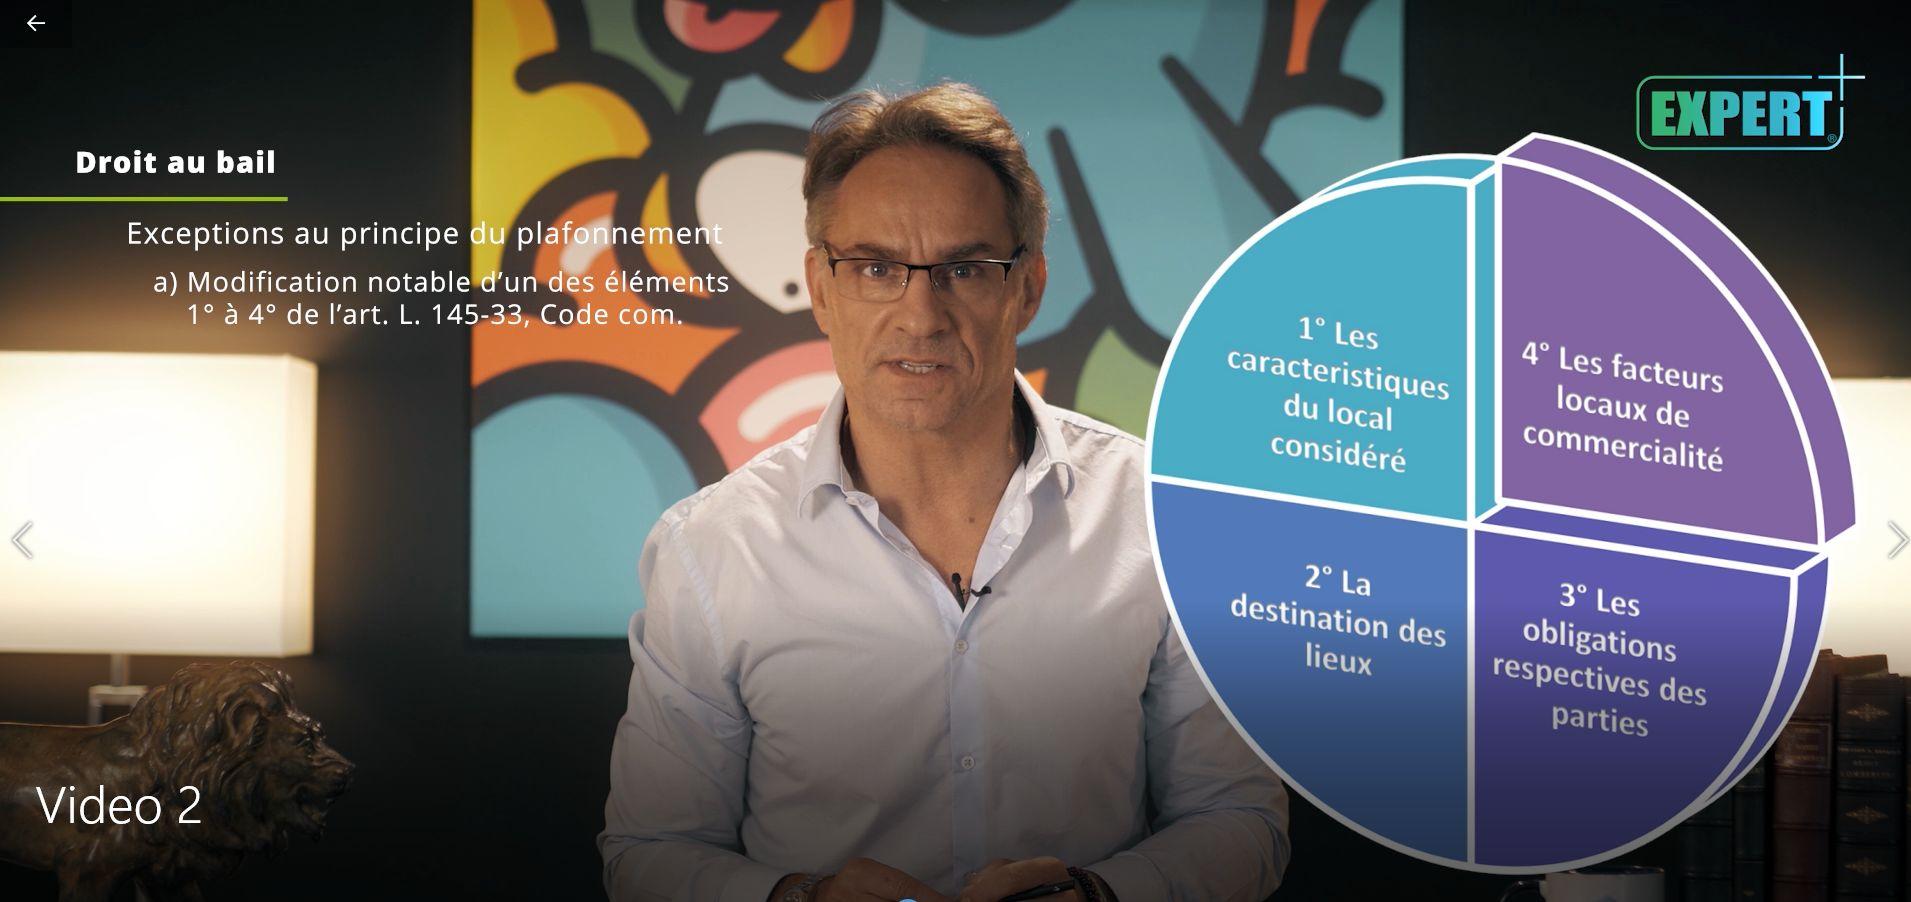 les formations du cfei en distanciel : modules blended e-learning